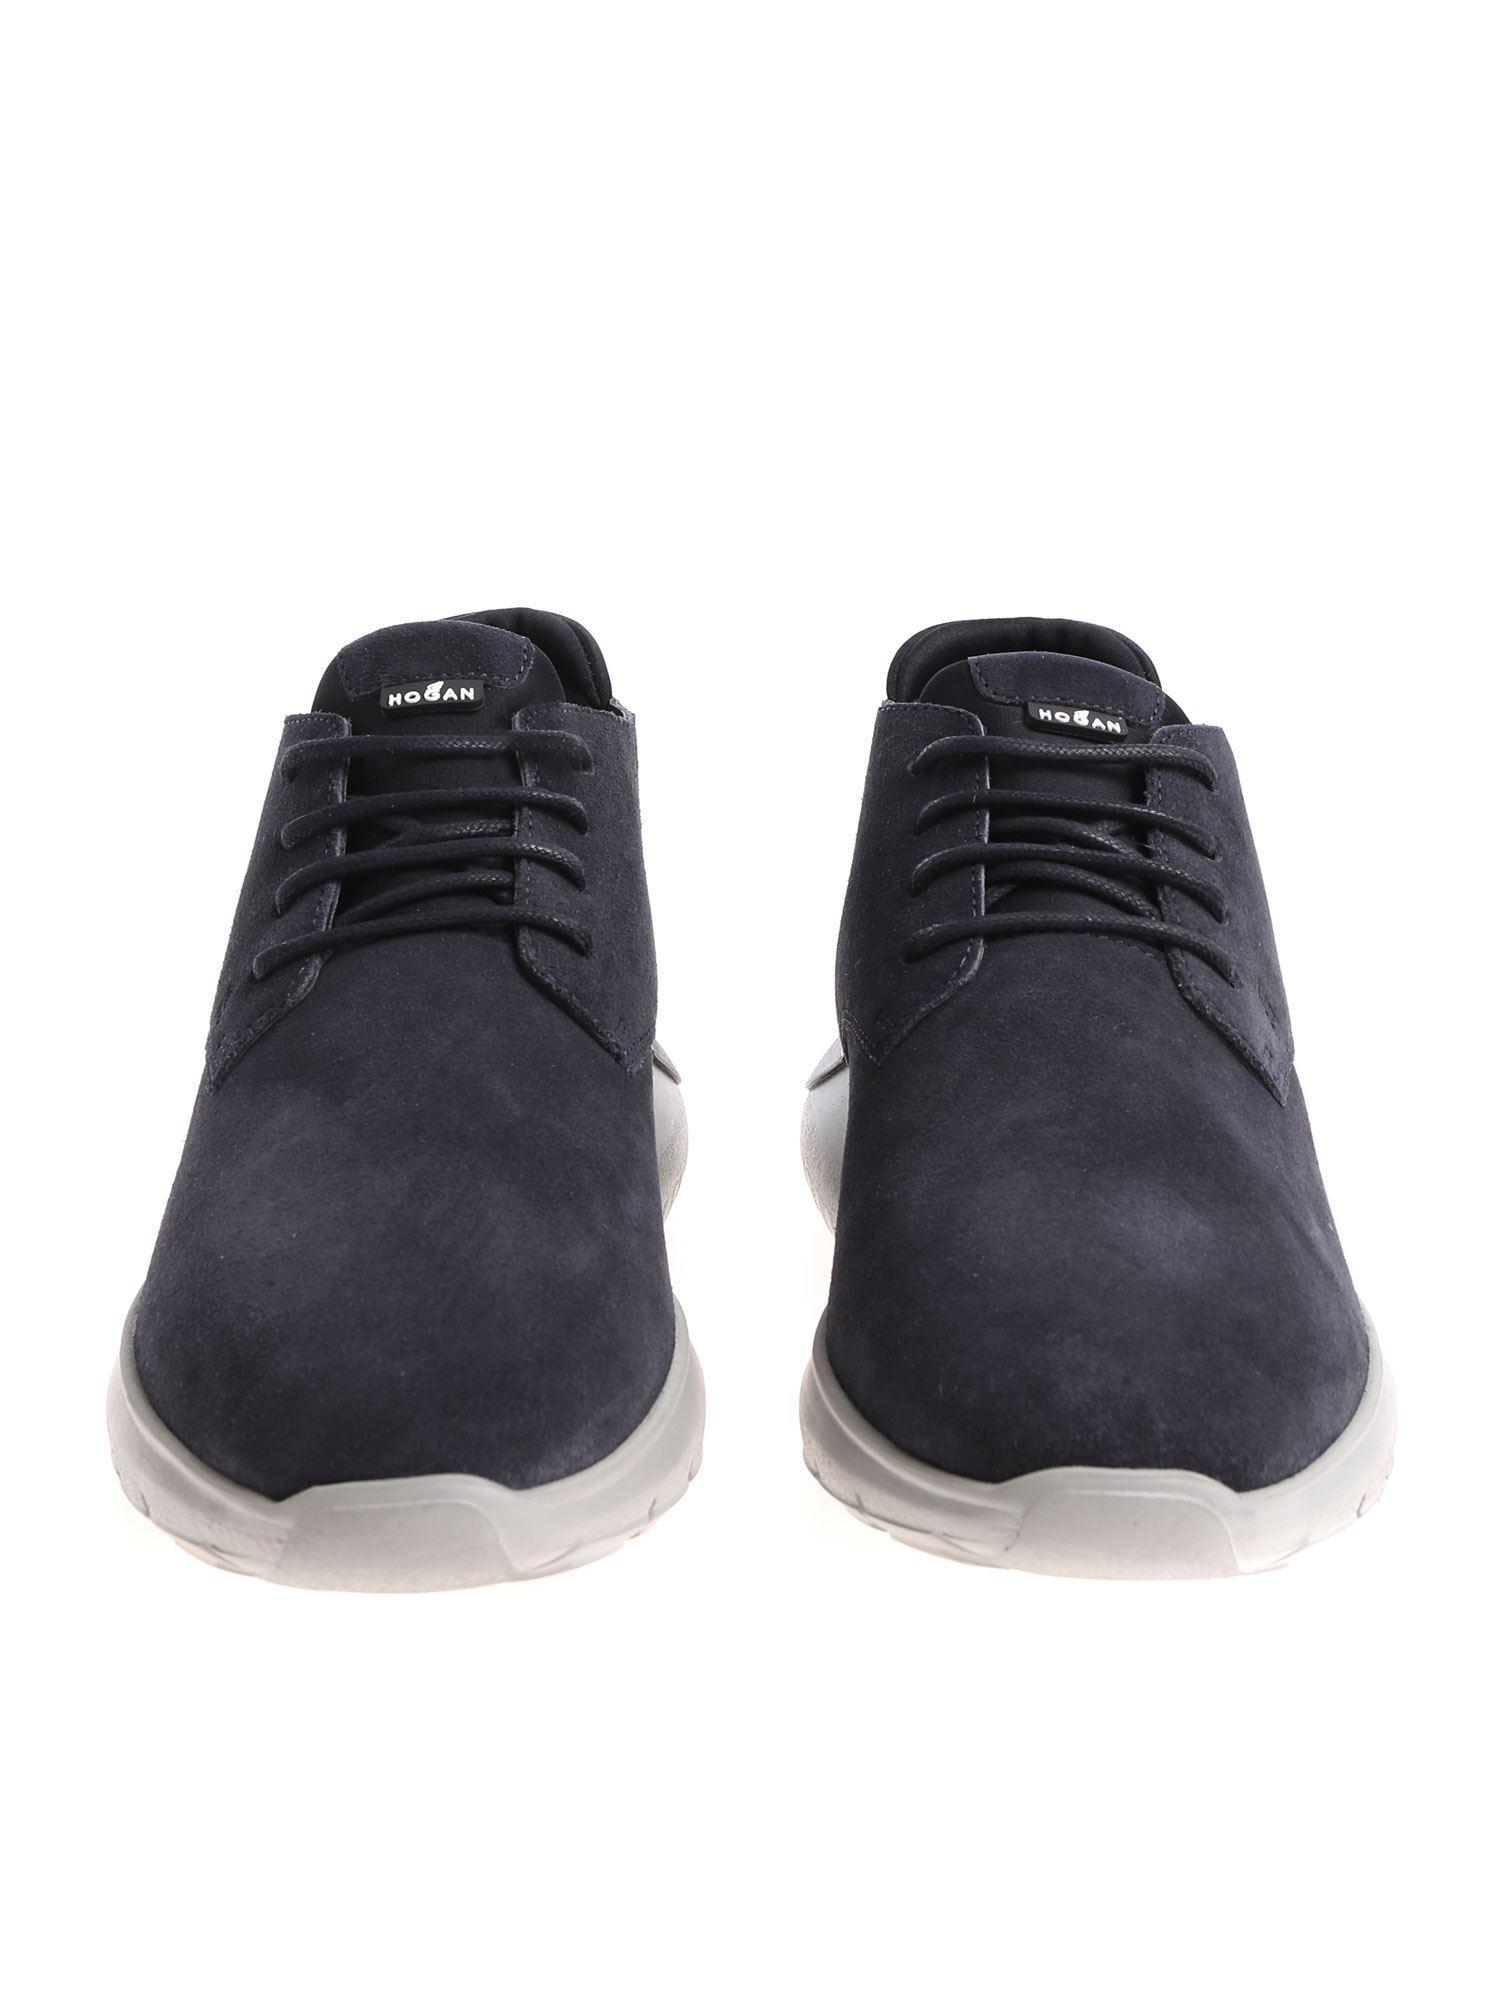 Lyst - Hogan Blue Interactive 3 Desert Boots in Blue for Men 58012f5ac27